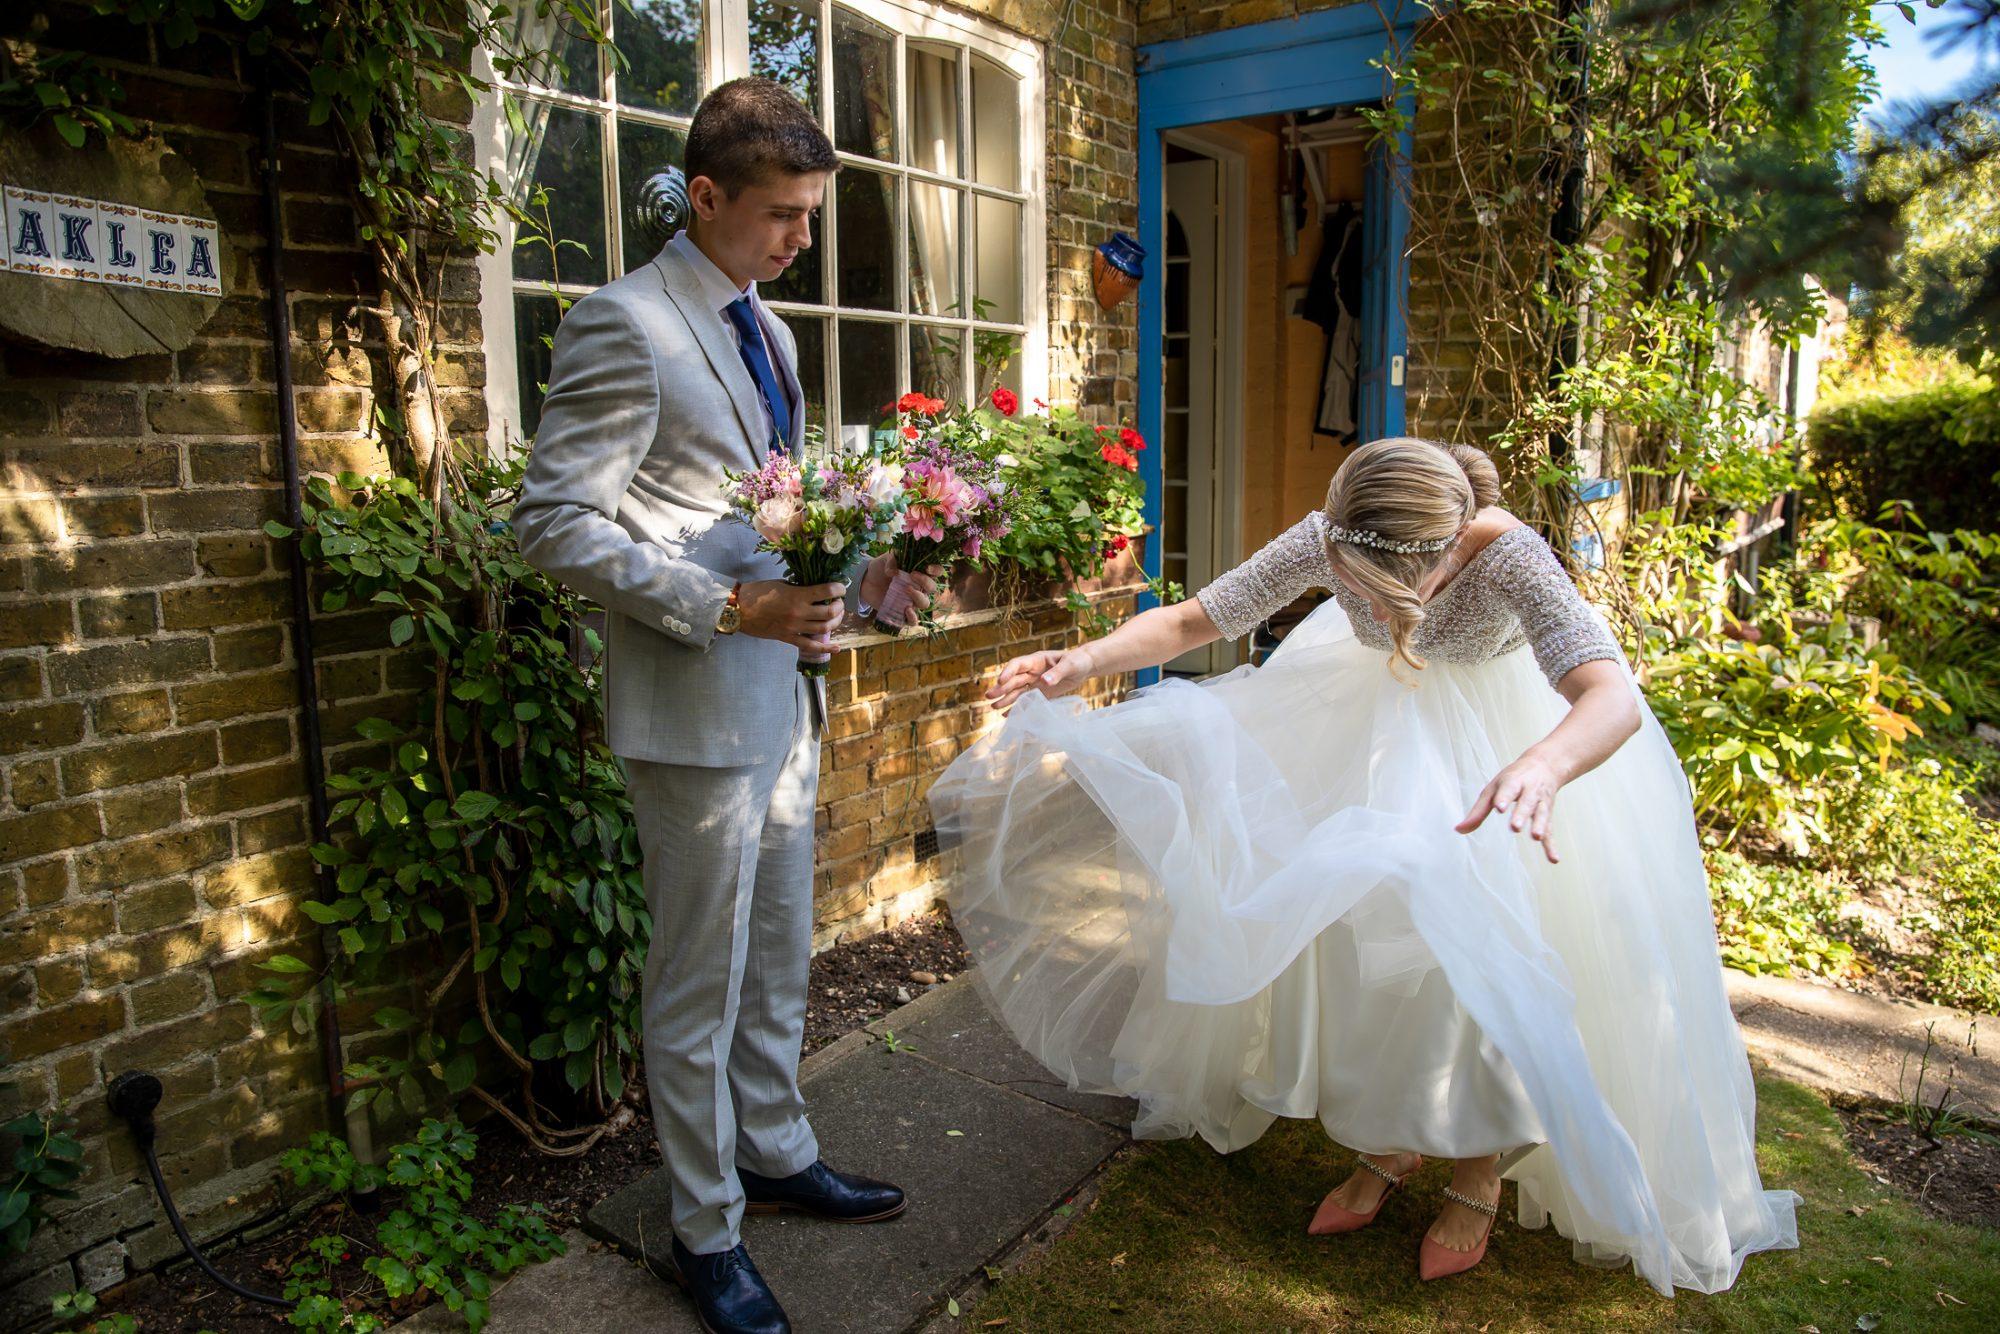 Hertfordshire weddings